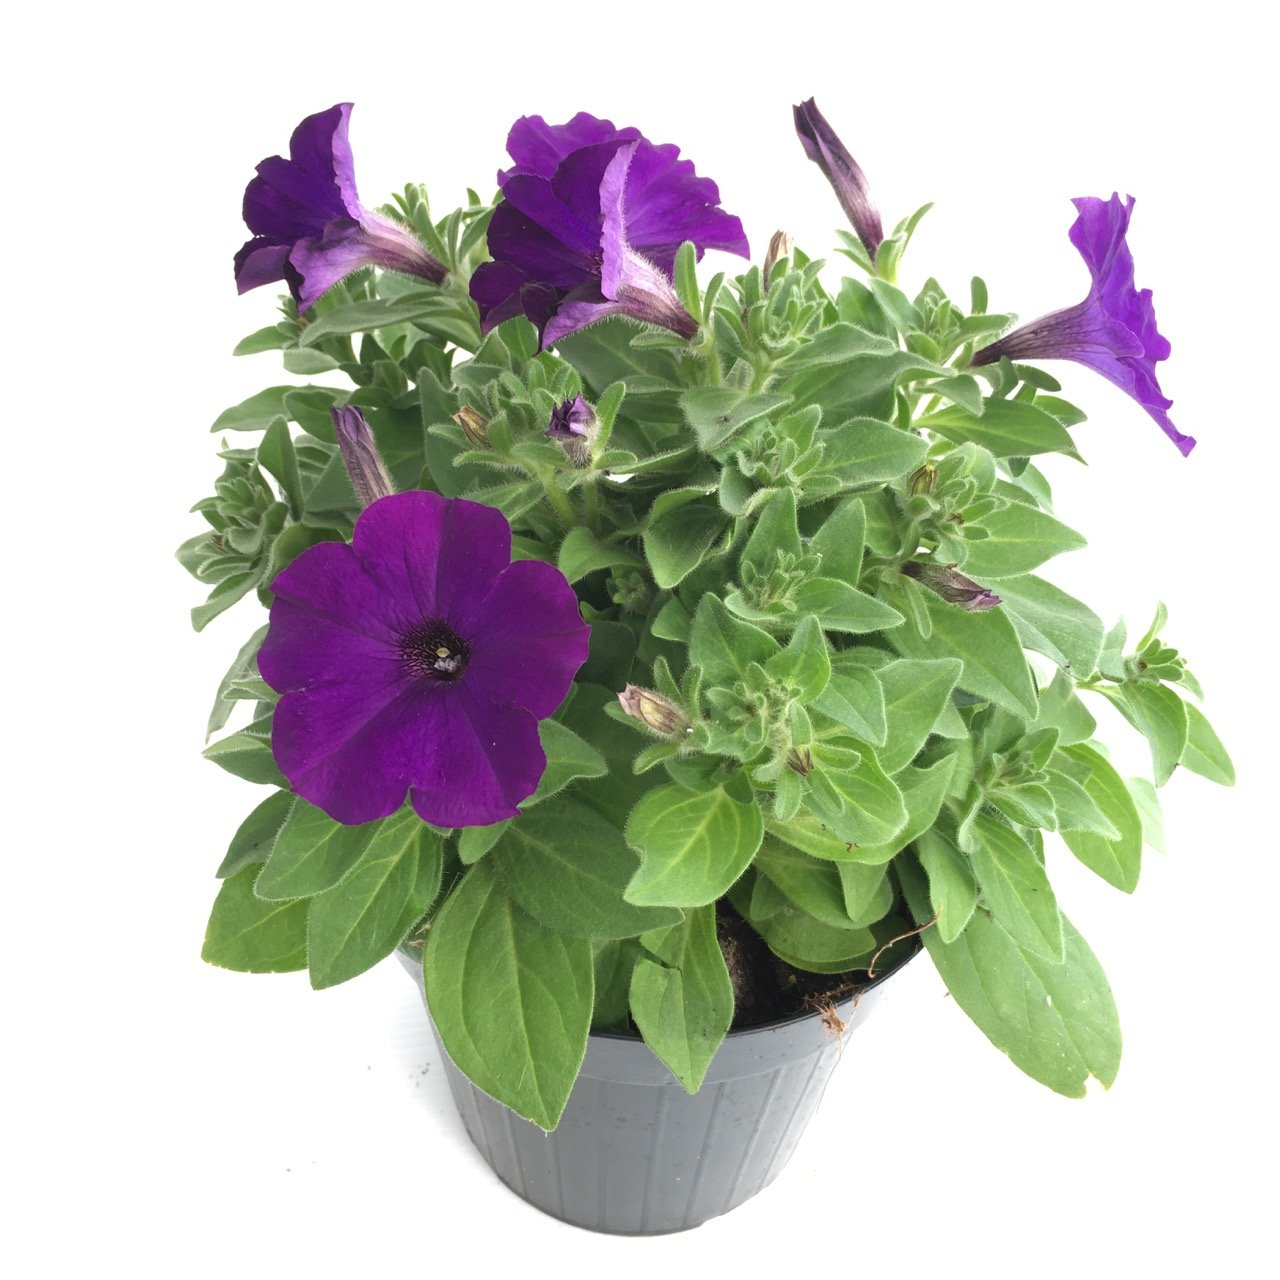 Petunia bingo petunia axillaris ibrida vivai frappetta for Petunie inverno